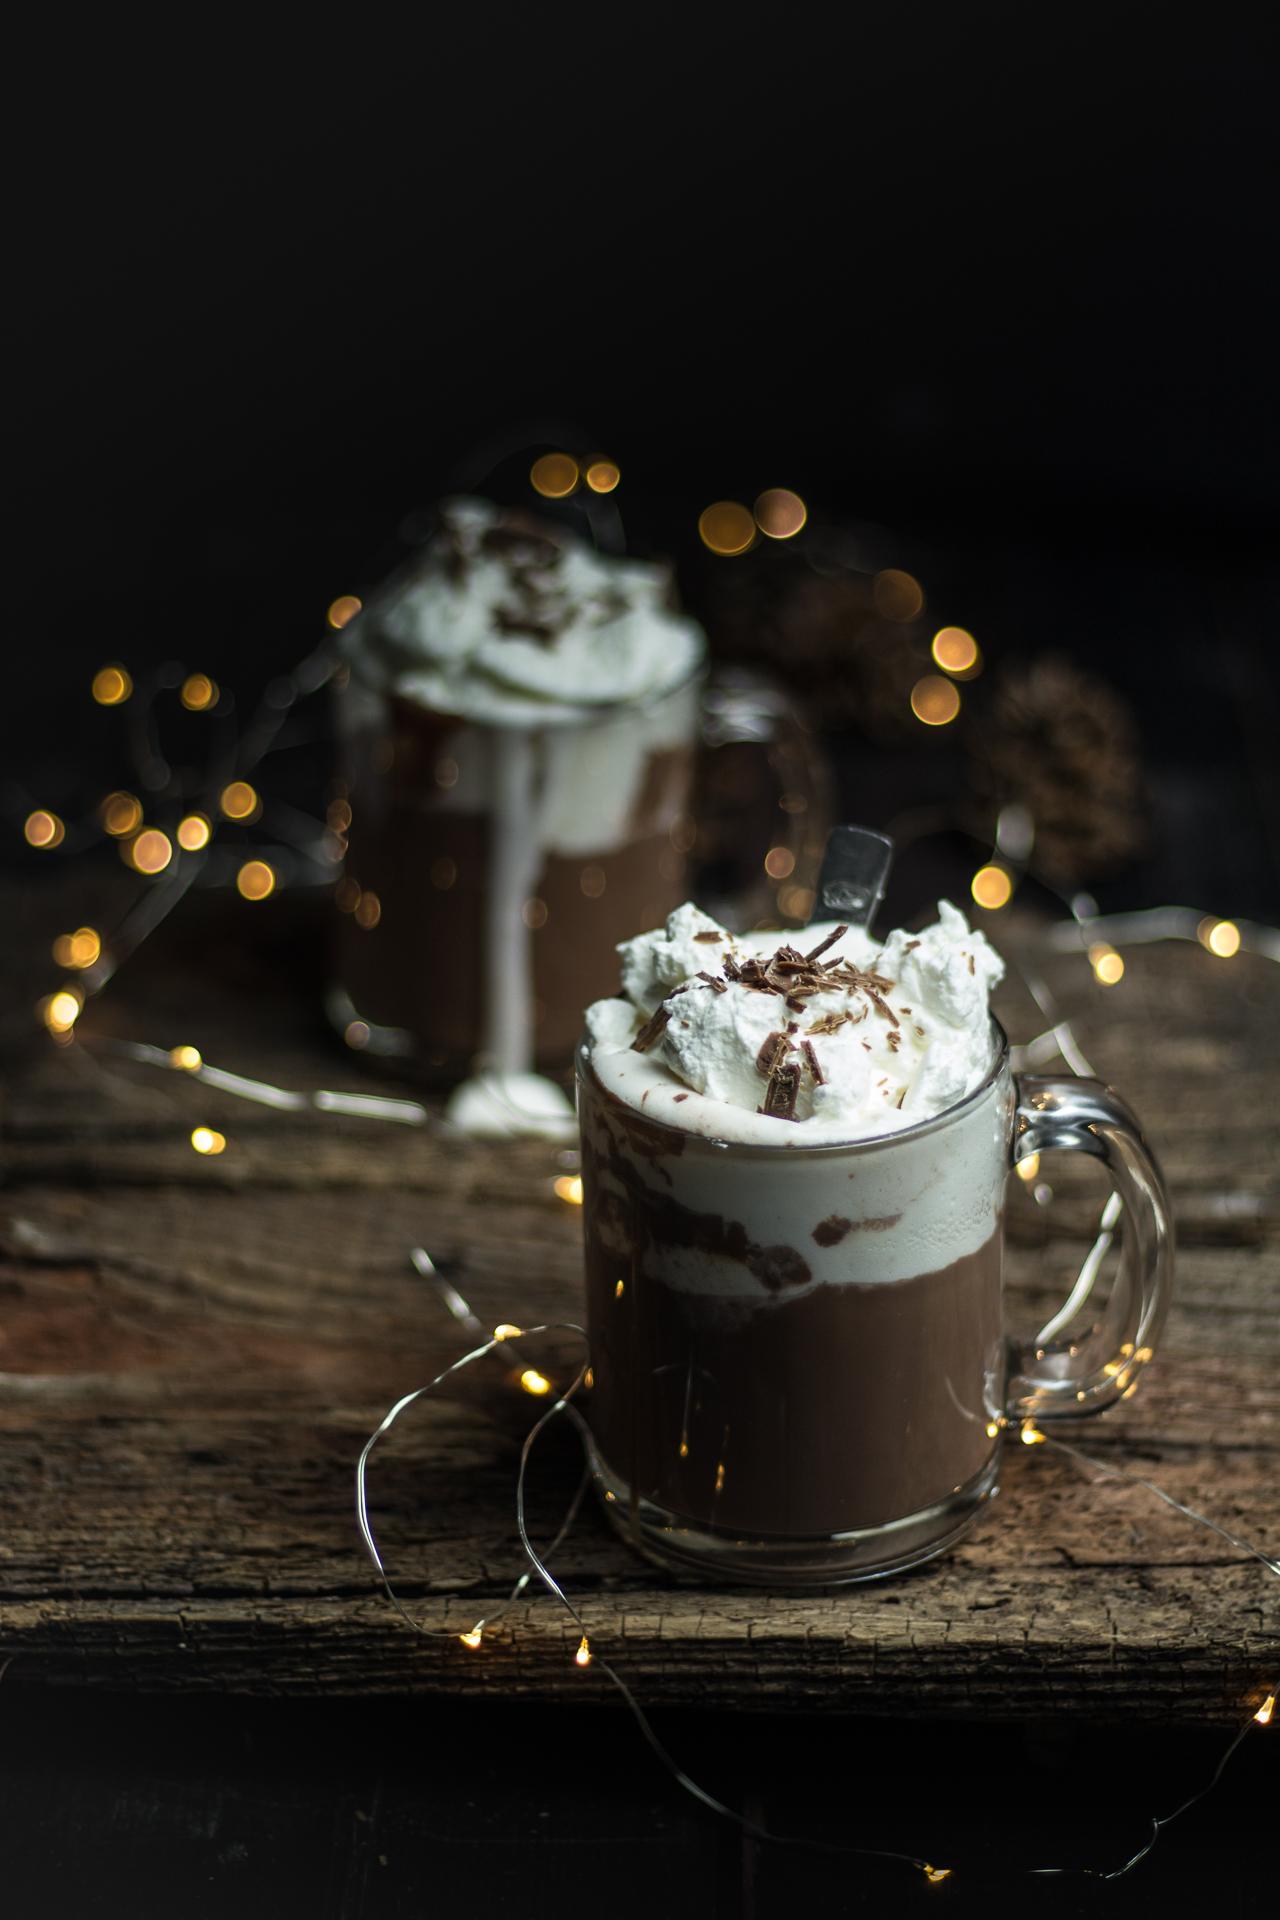 Cioccolata calda fatta in casa senza busta